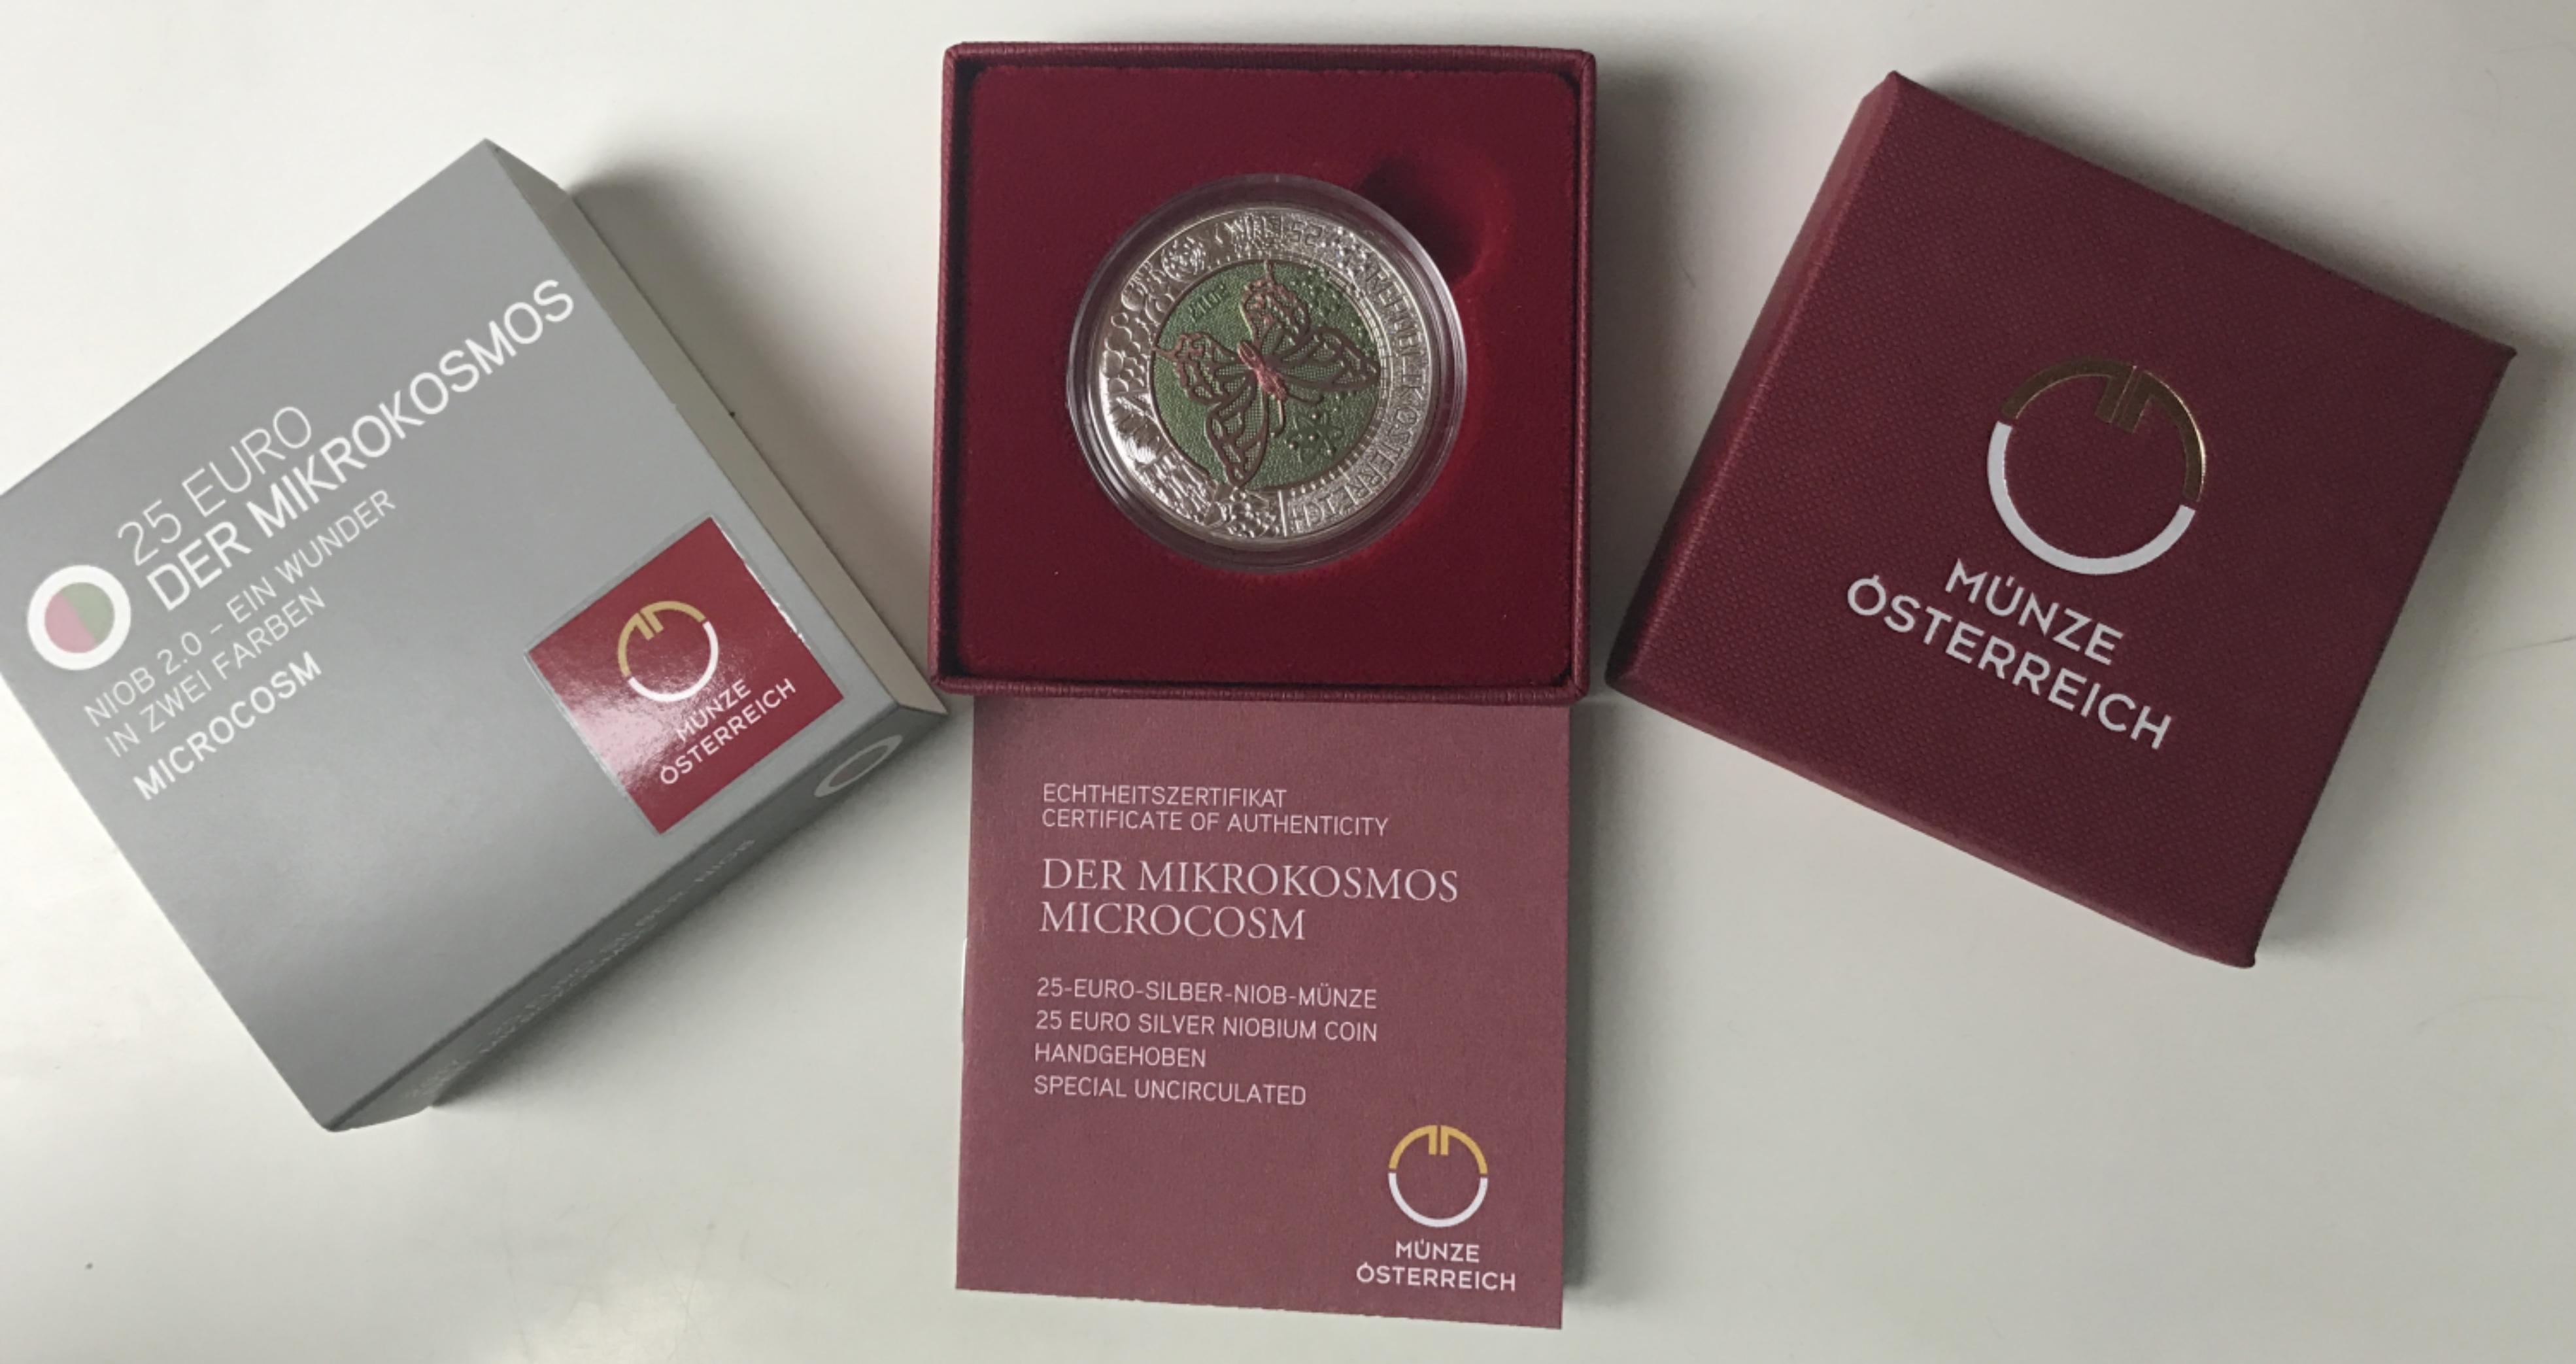 25 Euro Niob österreich 2017 Mikrokosmos Muenzhandel Kissercom